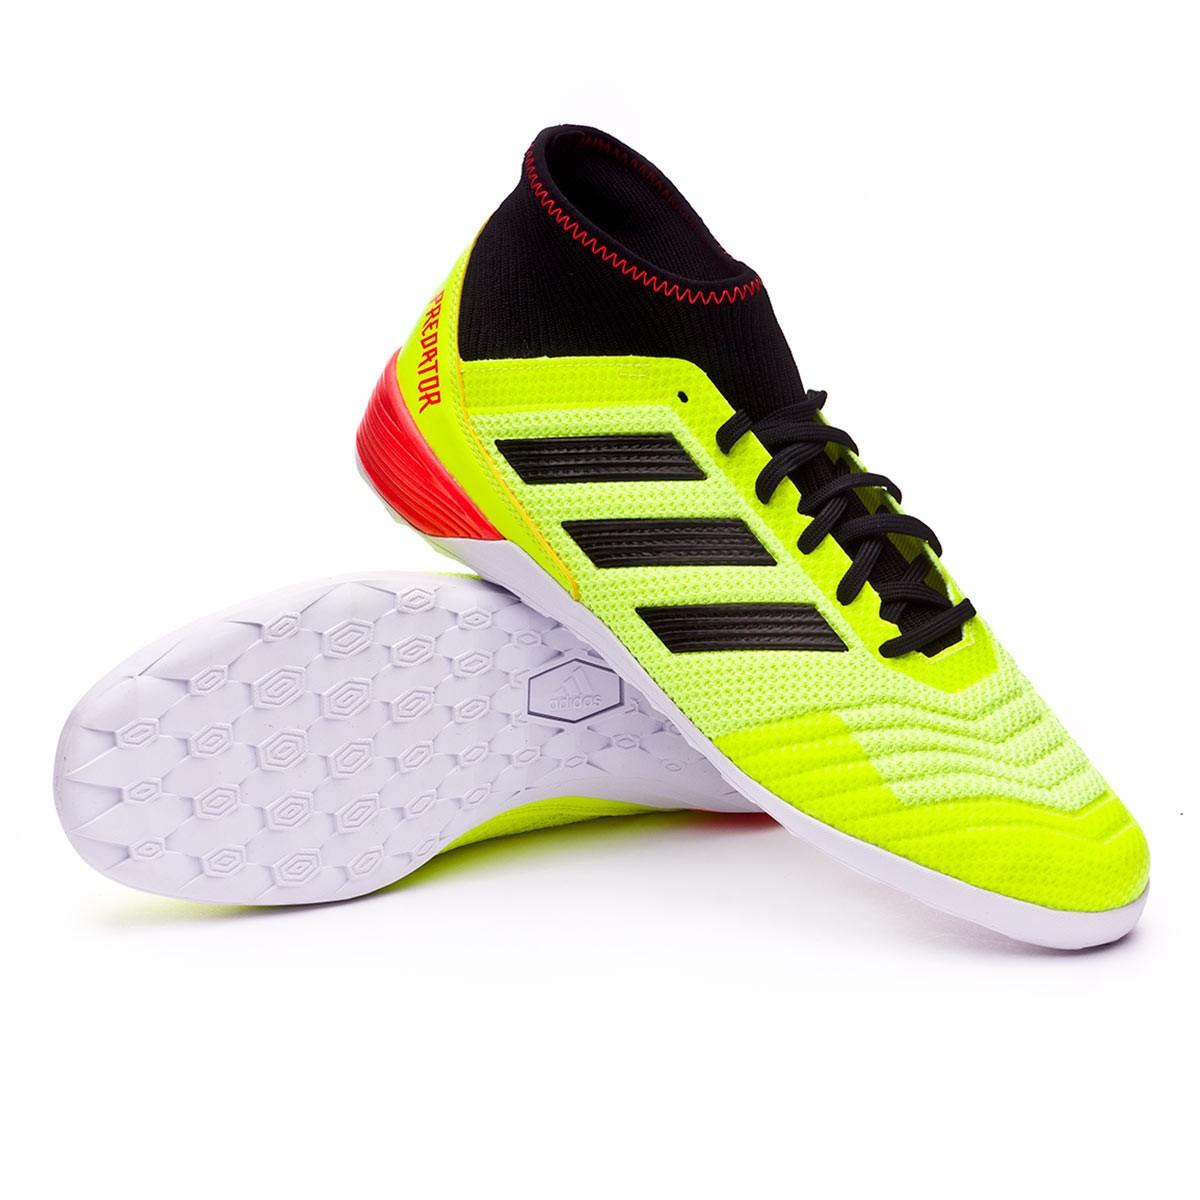 a238d7407 Futsal Boot adidas Predator Tango 18.3 IN Solar yellow-Black-Solar red -  Football store Fútbol Emotion